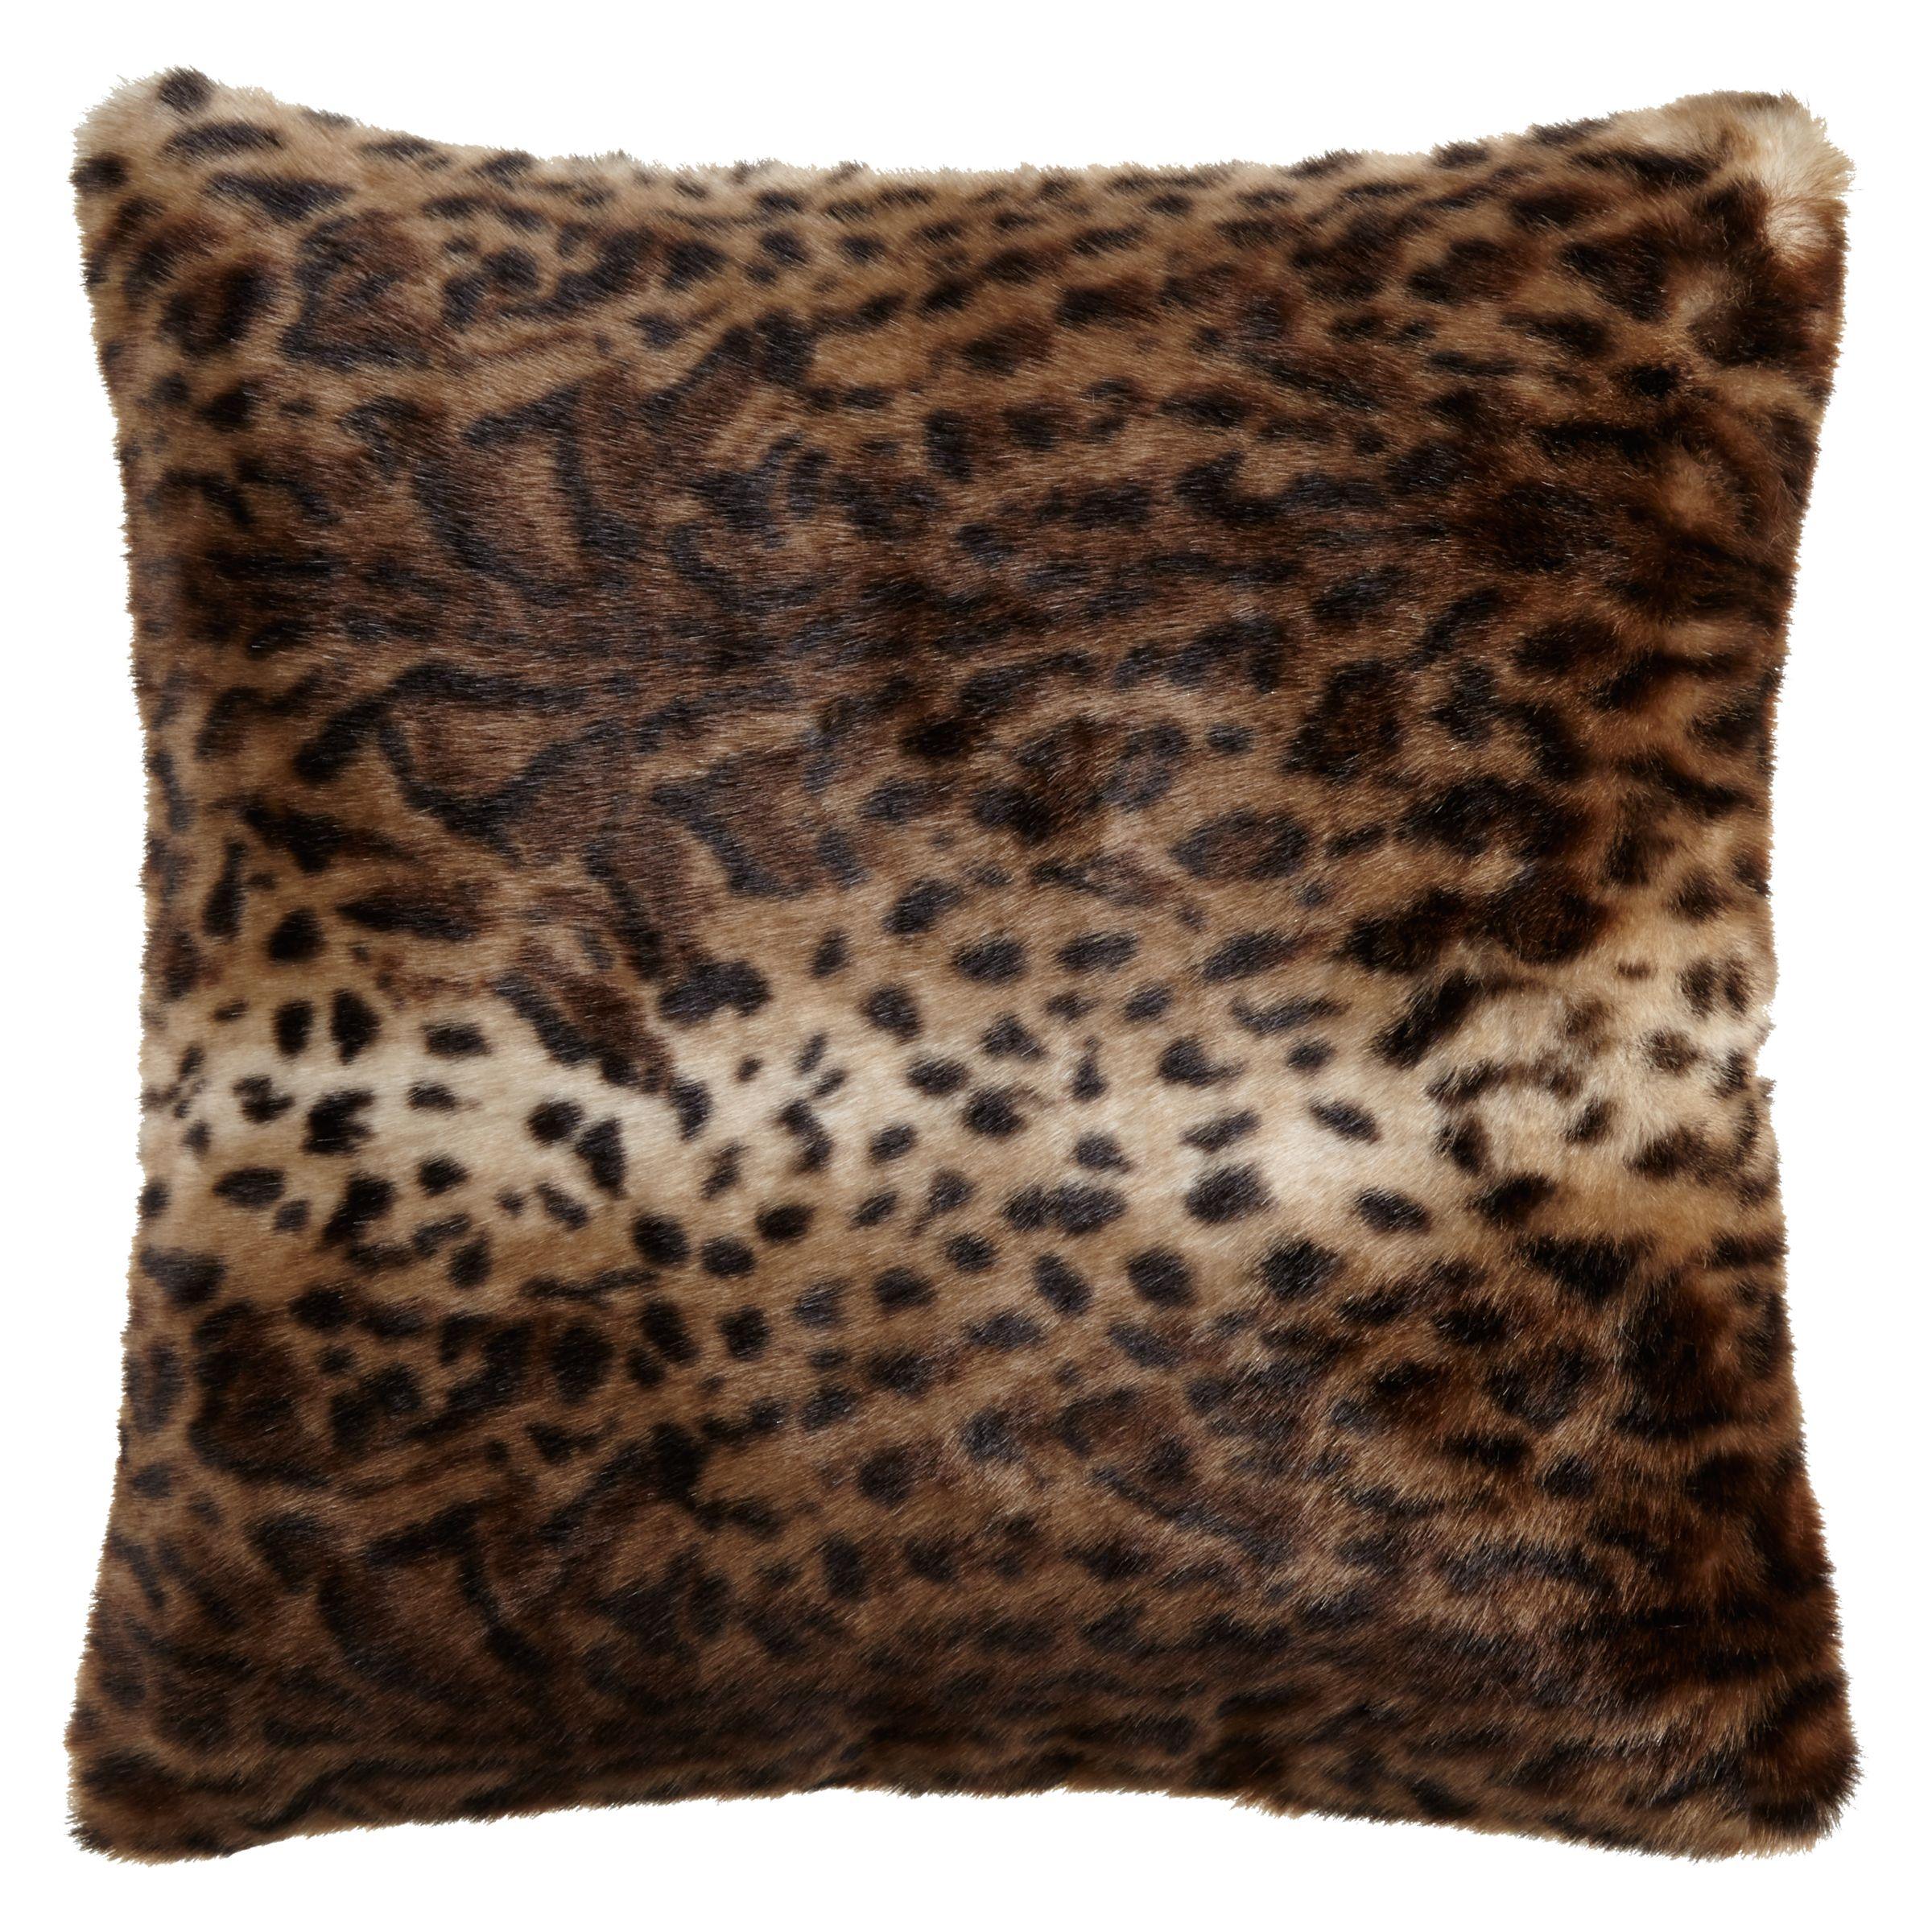 Helene Berman Helene Berman Brown Jaguar Faux Fur Cushion